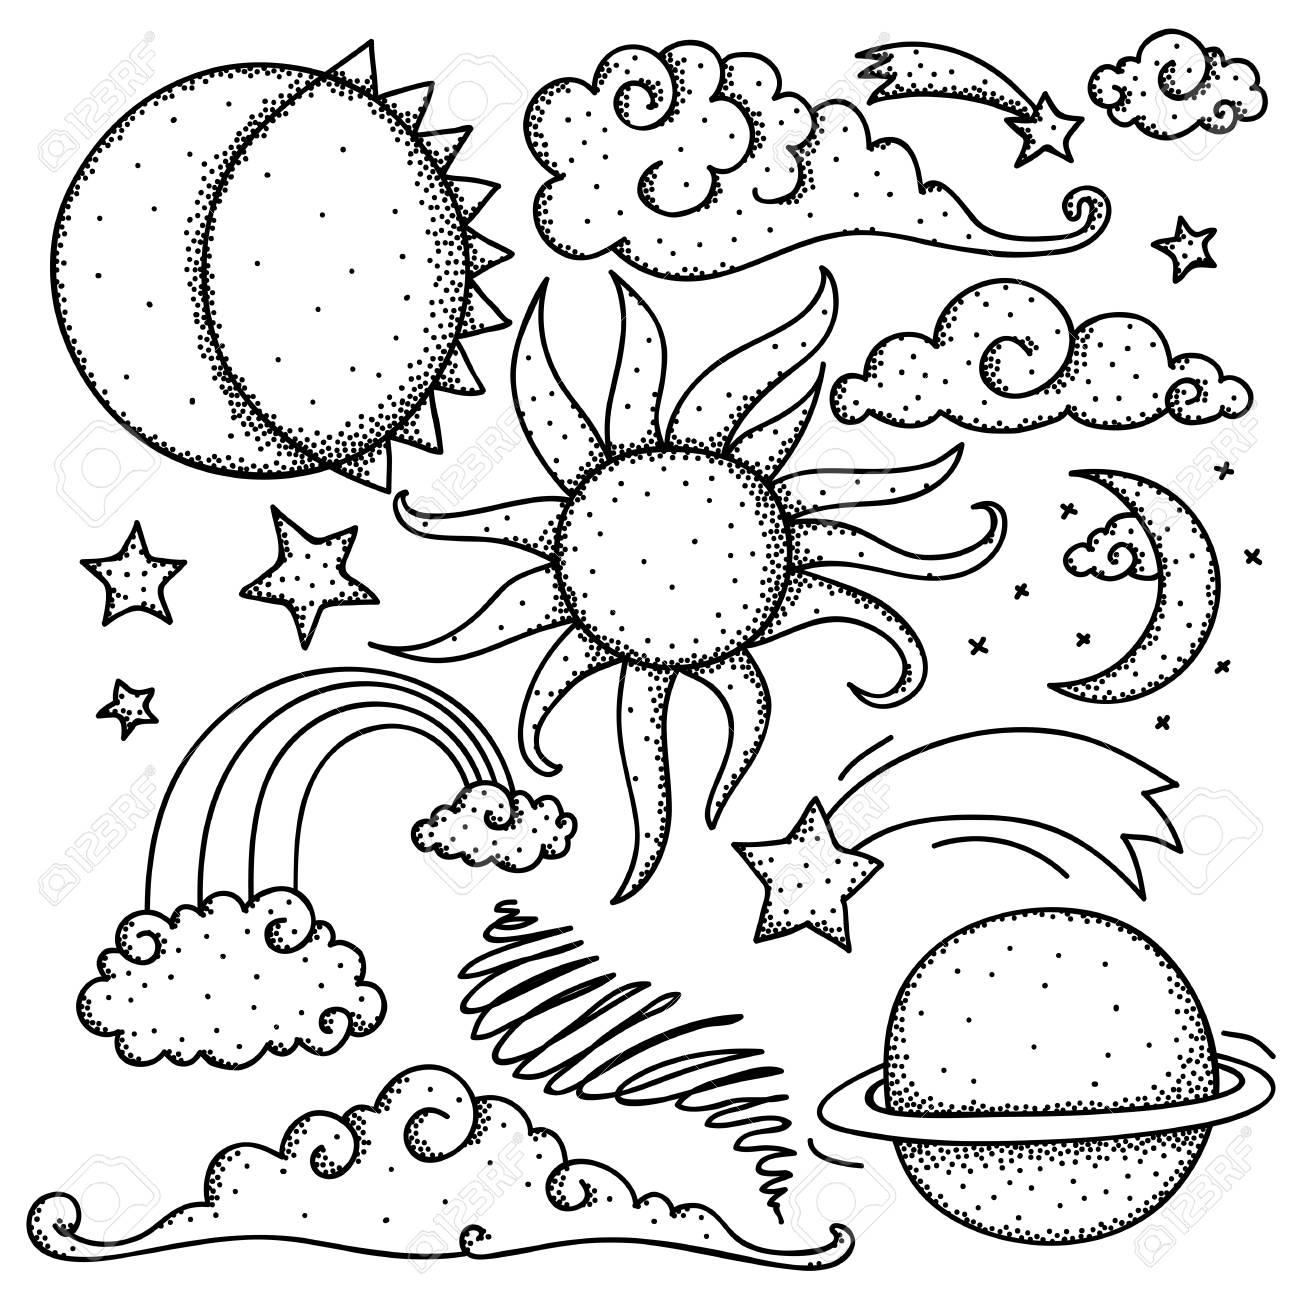 Computer Icons Sunlight Black Sun, SUN RAY, angle, white, animals png    Klipartz